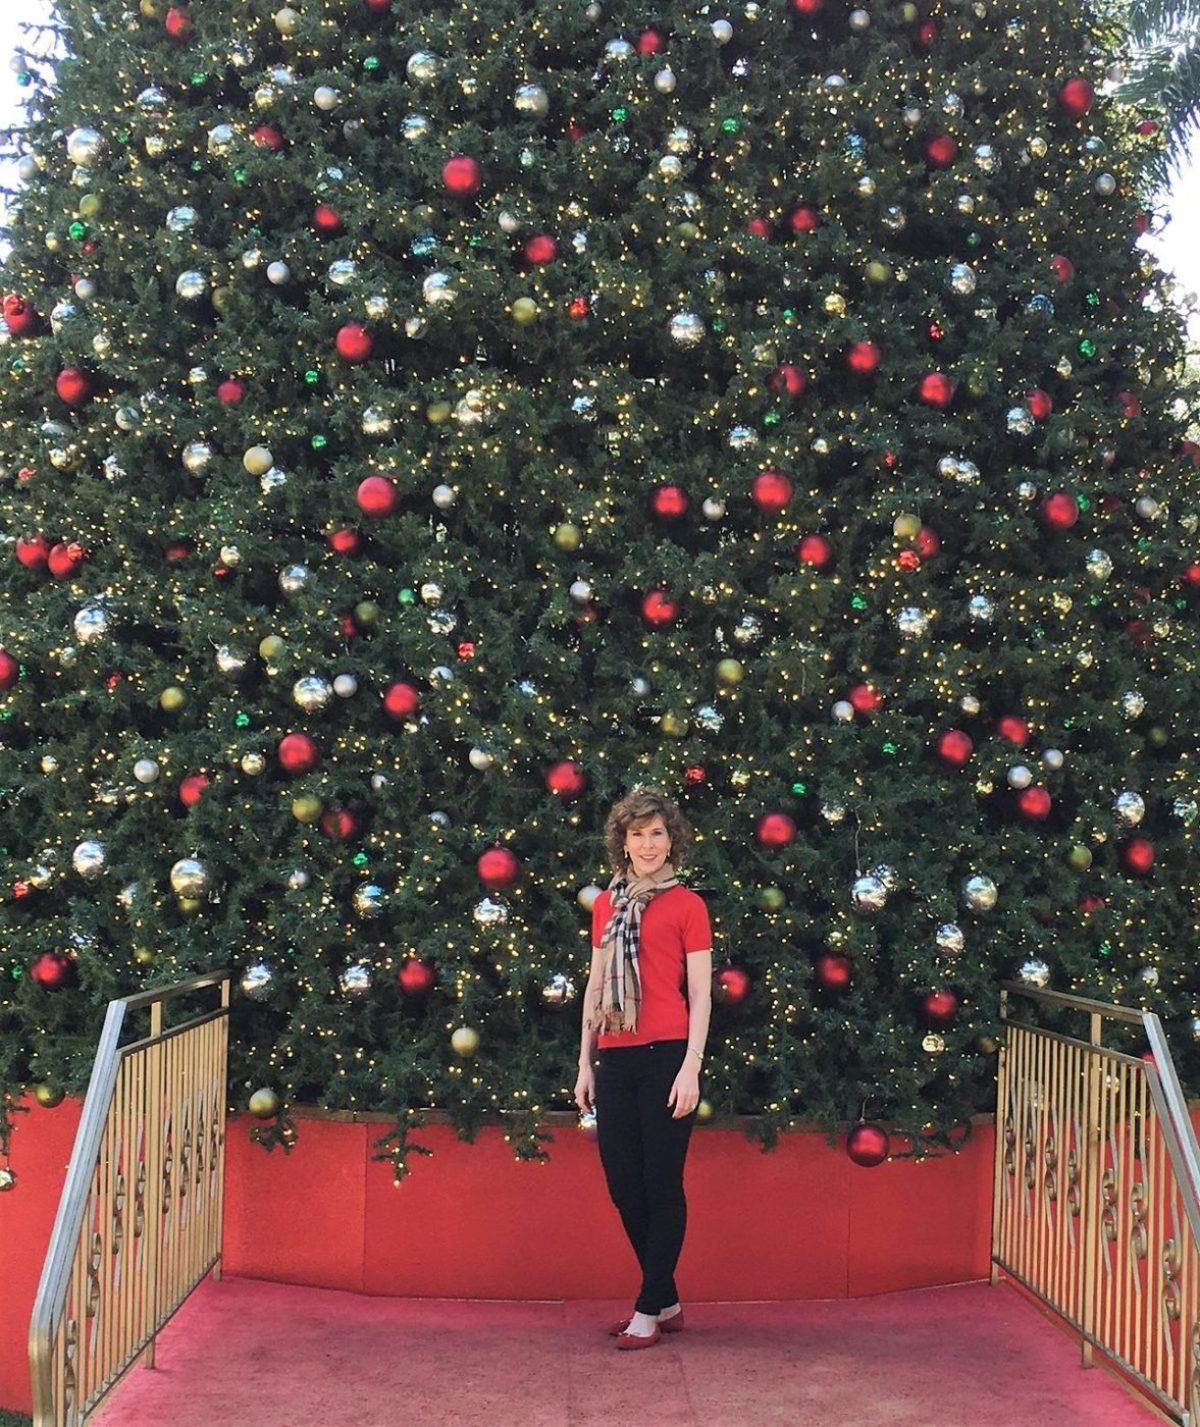 holidays in miami, christmas in miami, empty nester holiday getaway, merrick park christmas tree